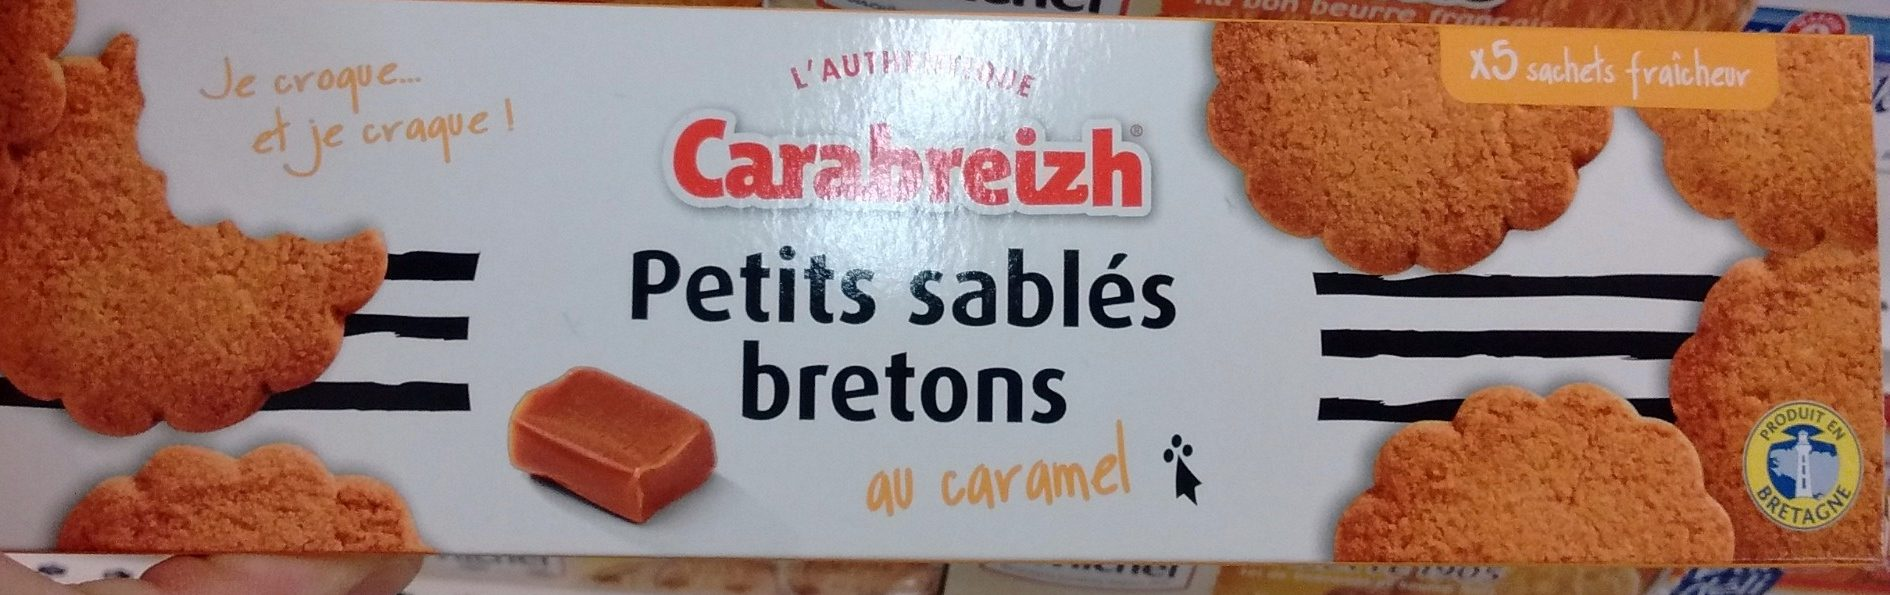 Petits Sablés Bretons au Caramel - Product